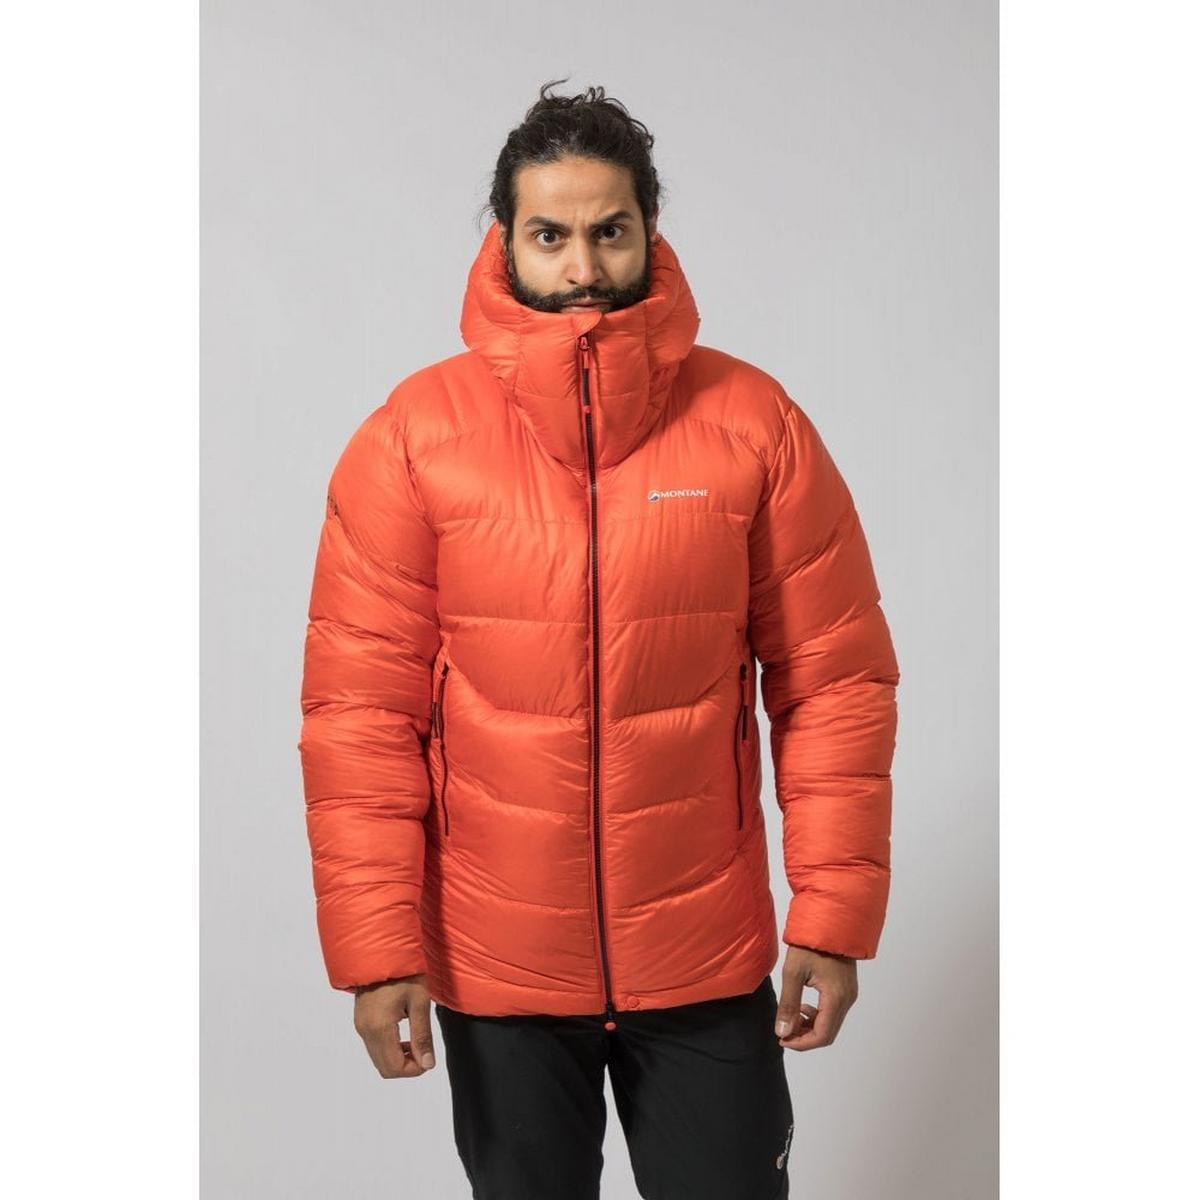 Montane Men's Alpine 850 Jacket - Orange